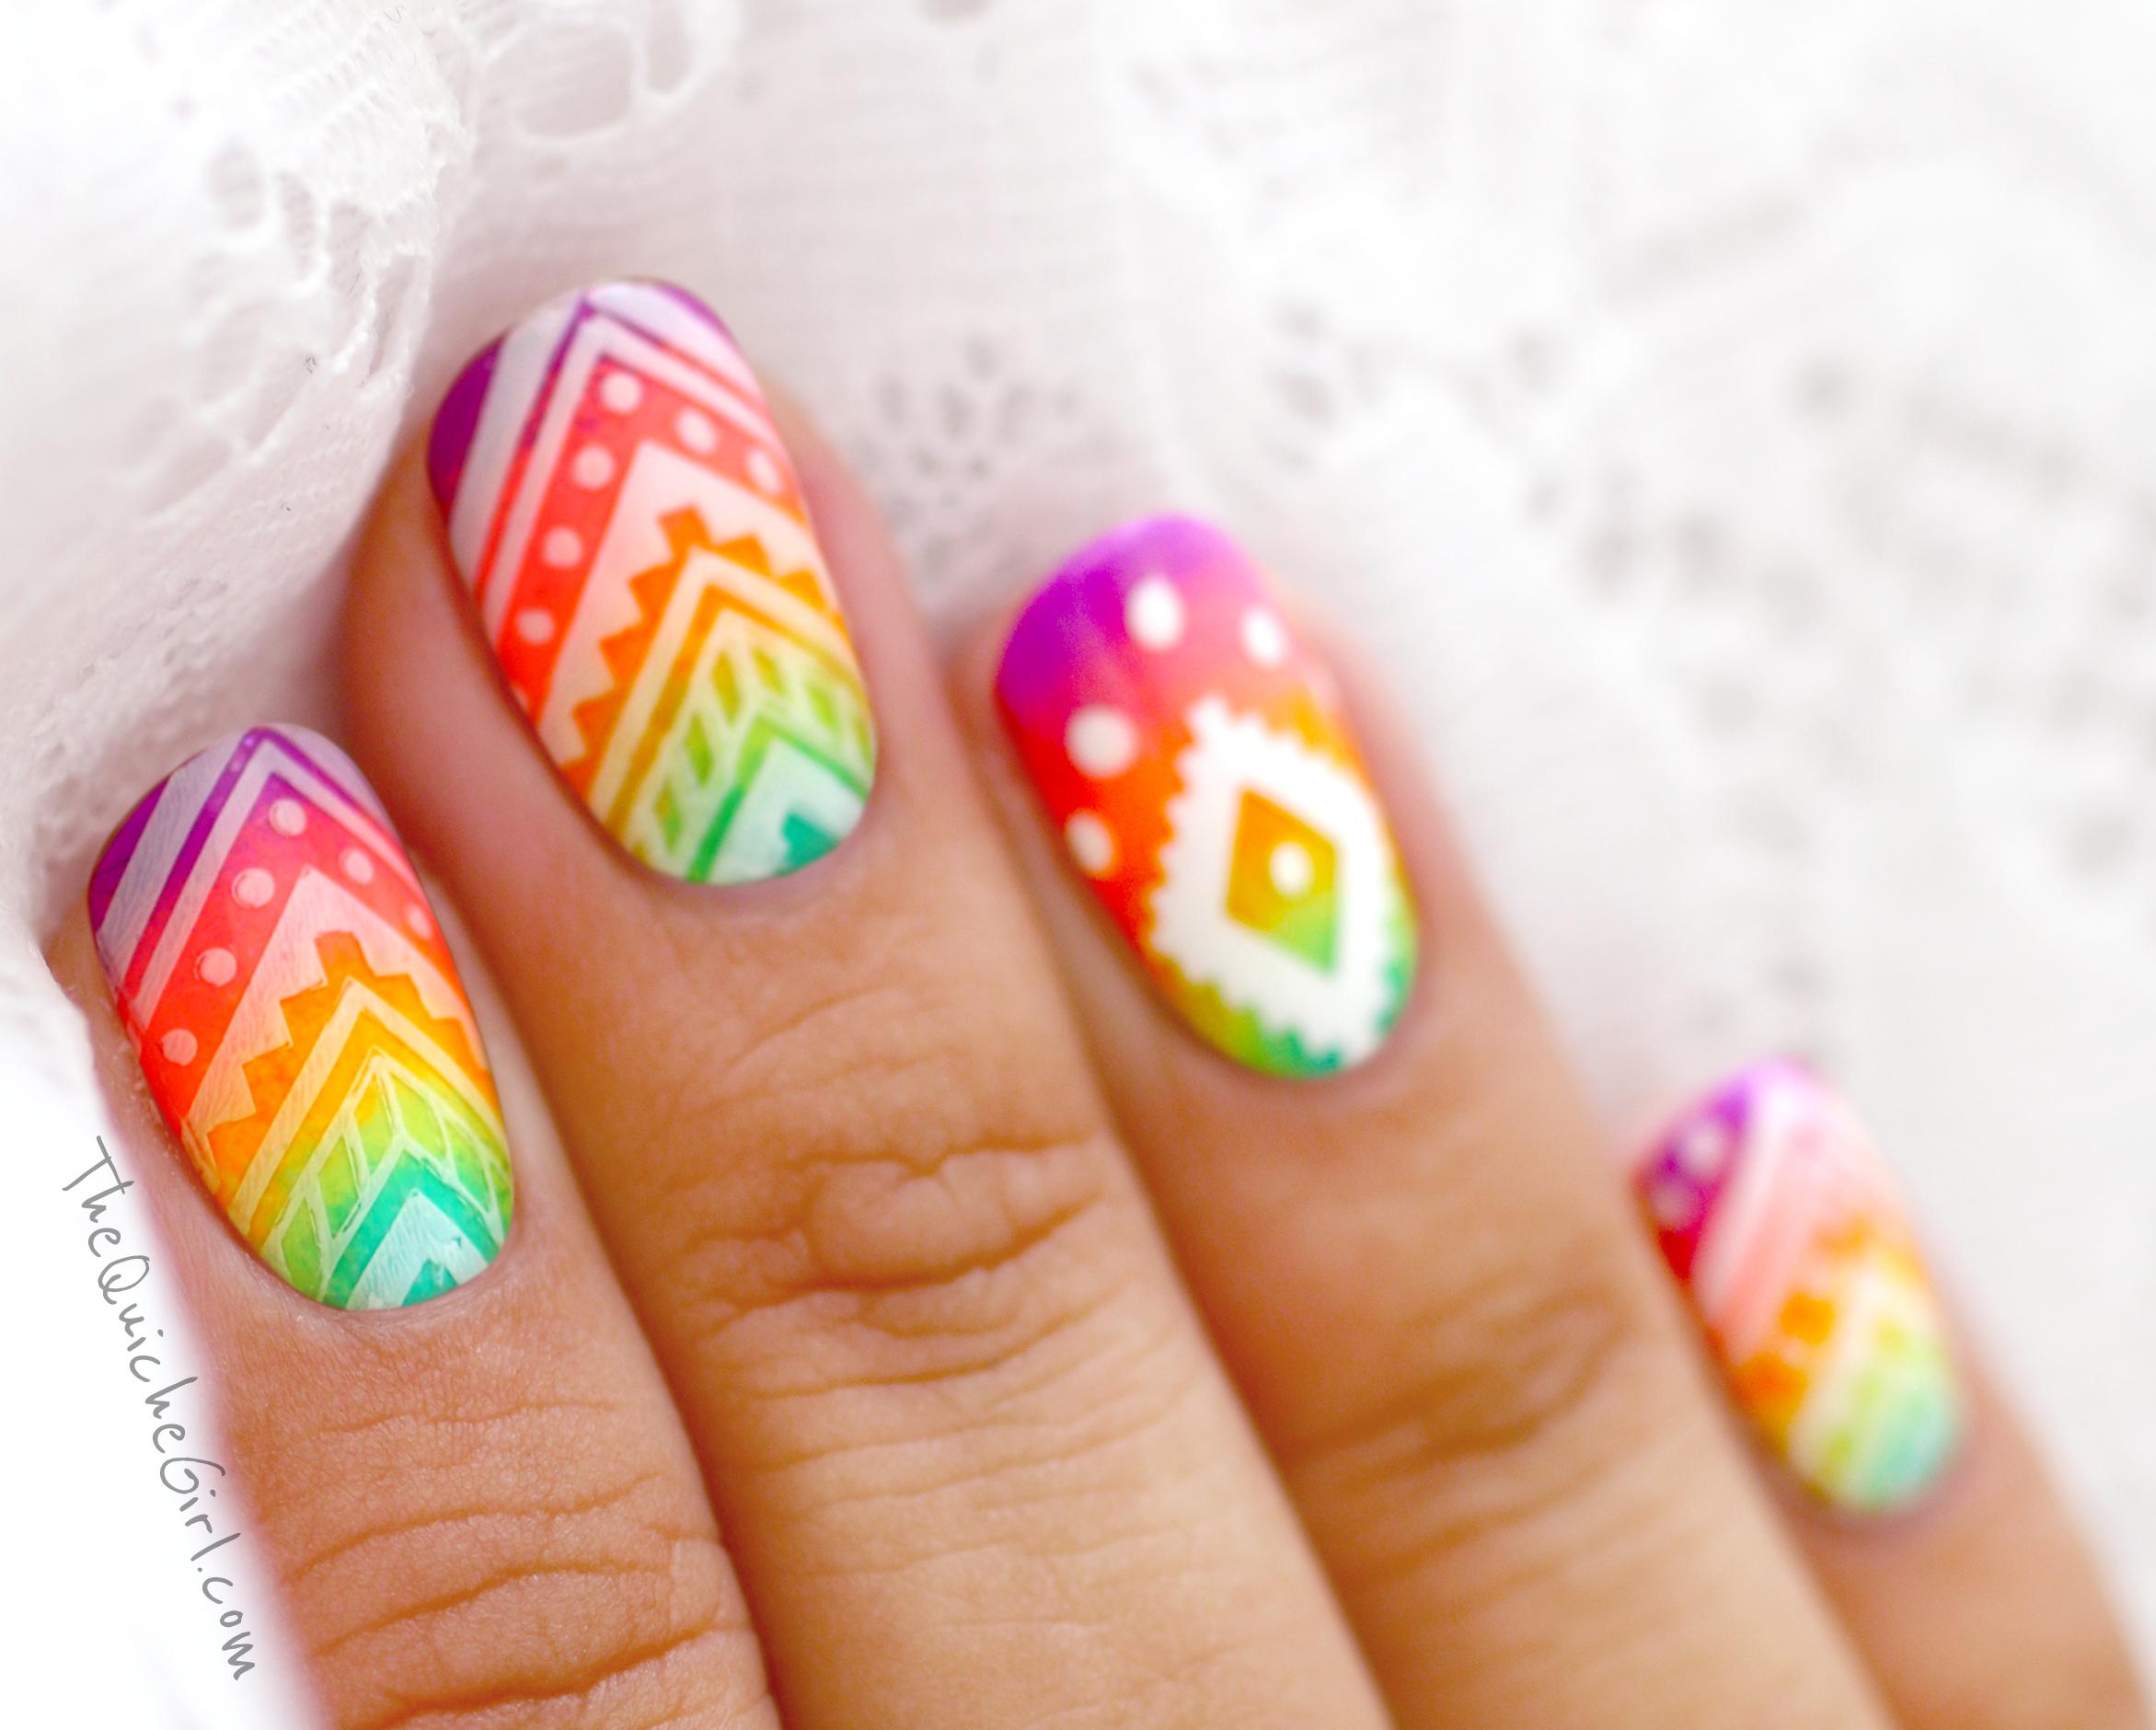 azteque, gradient, neon, China Glaze,stamping, topatopa QuicheGirl